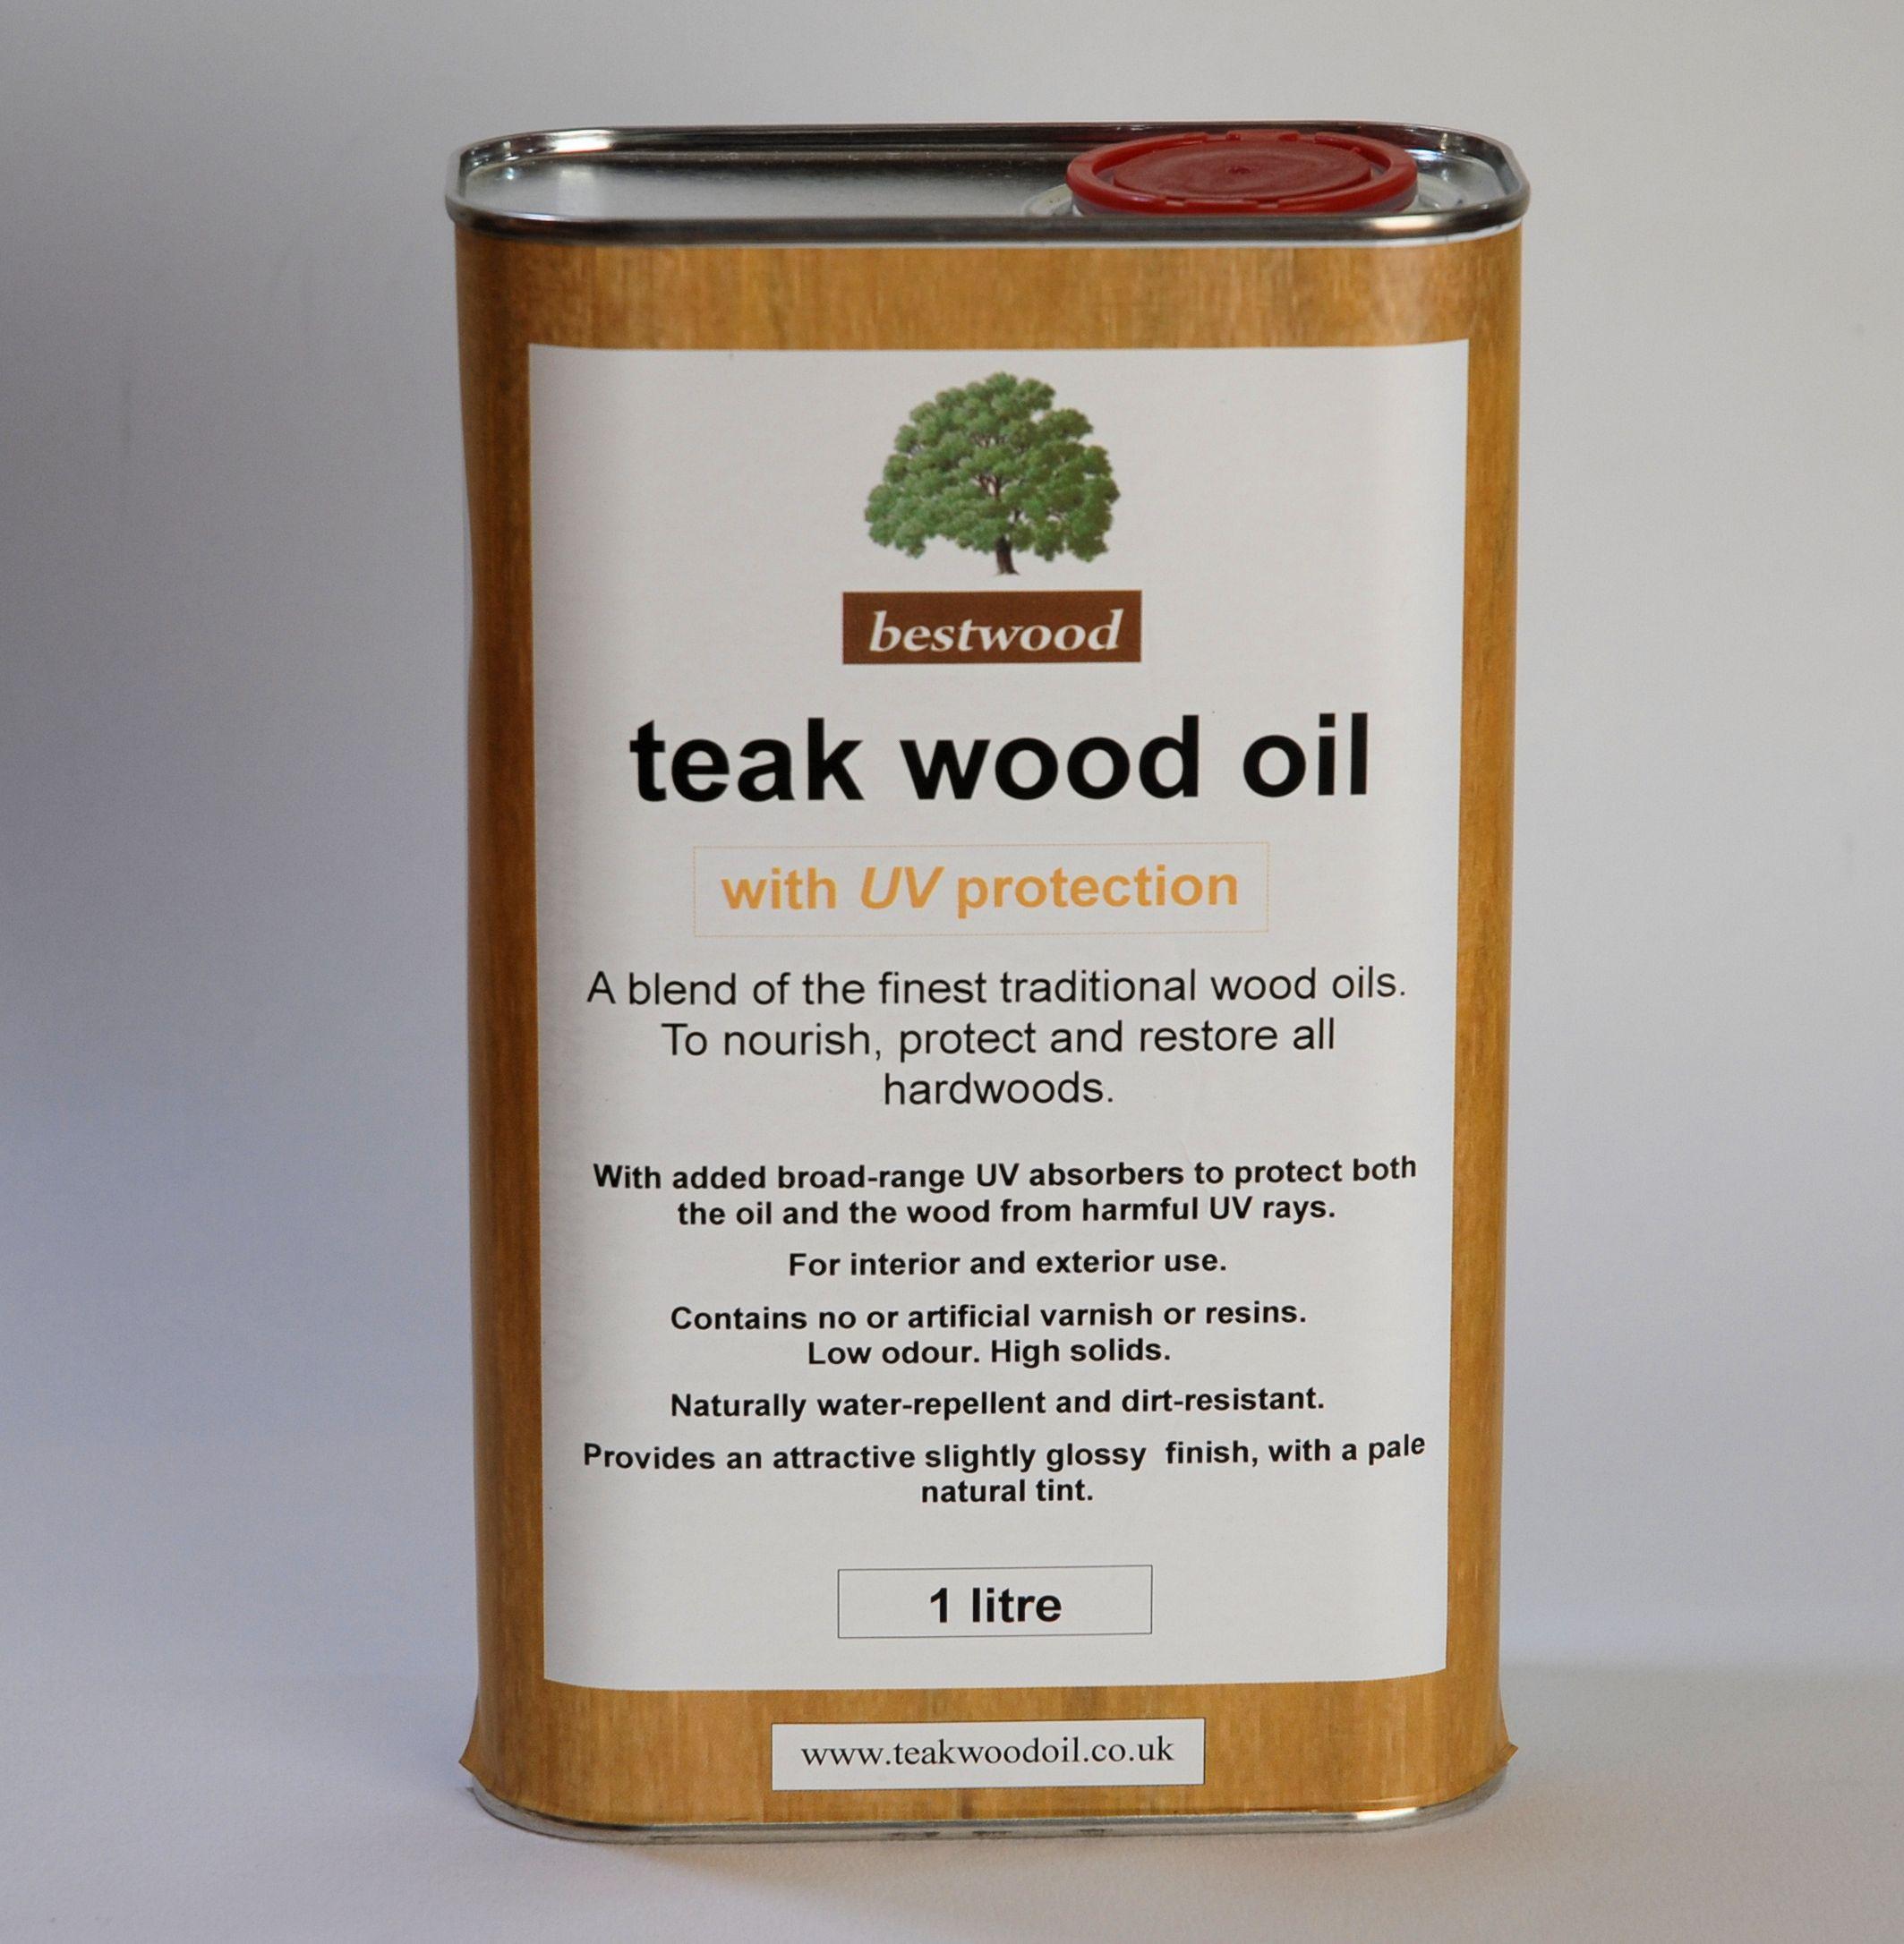 teak wood oil 1 litre